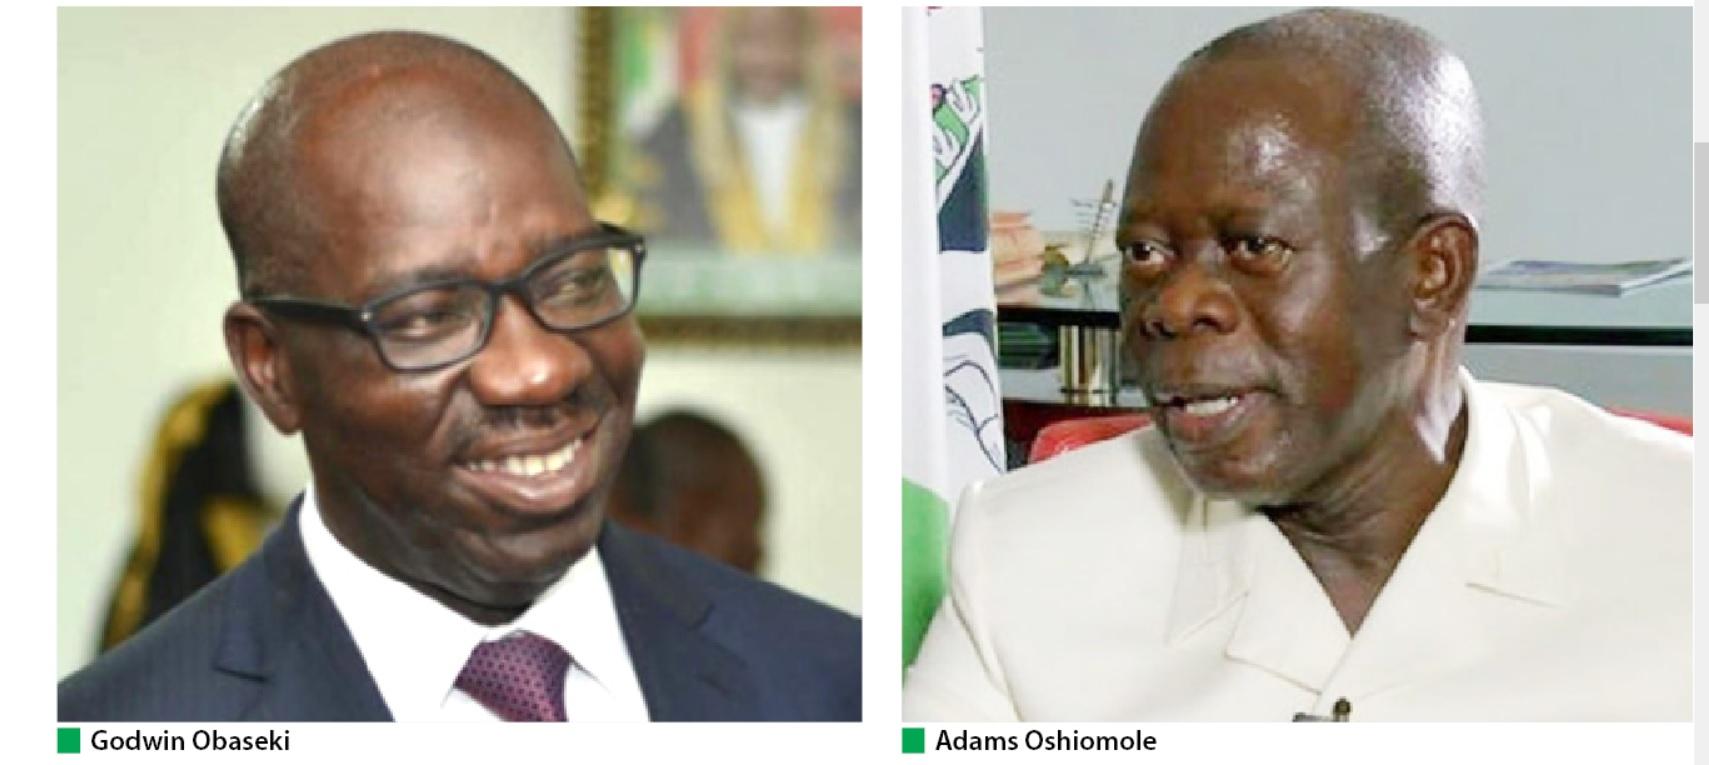 Adams Oshiomhole vs Obaseki